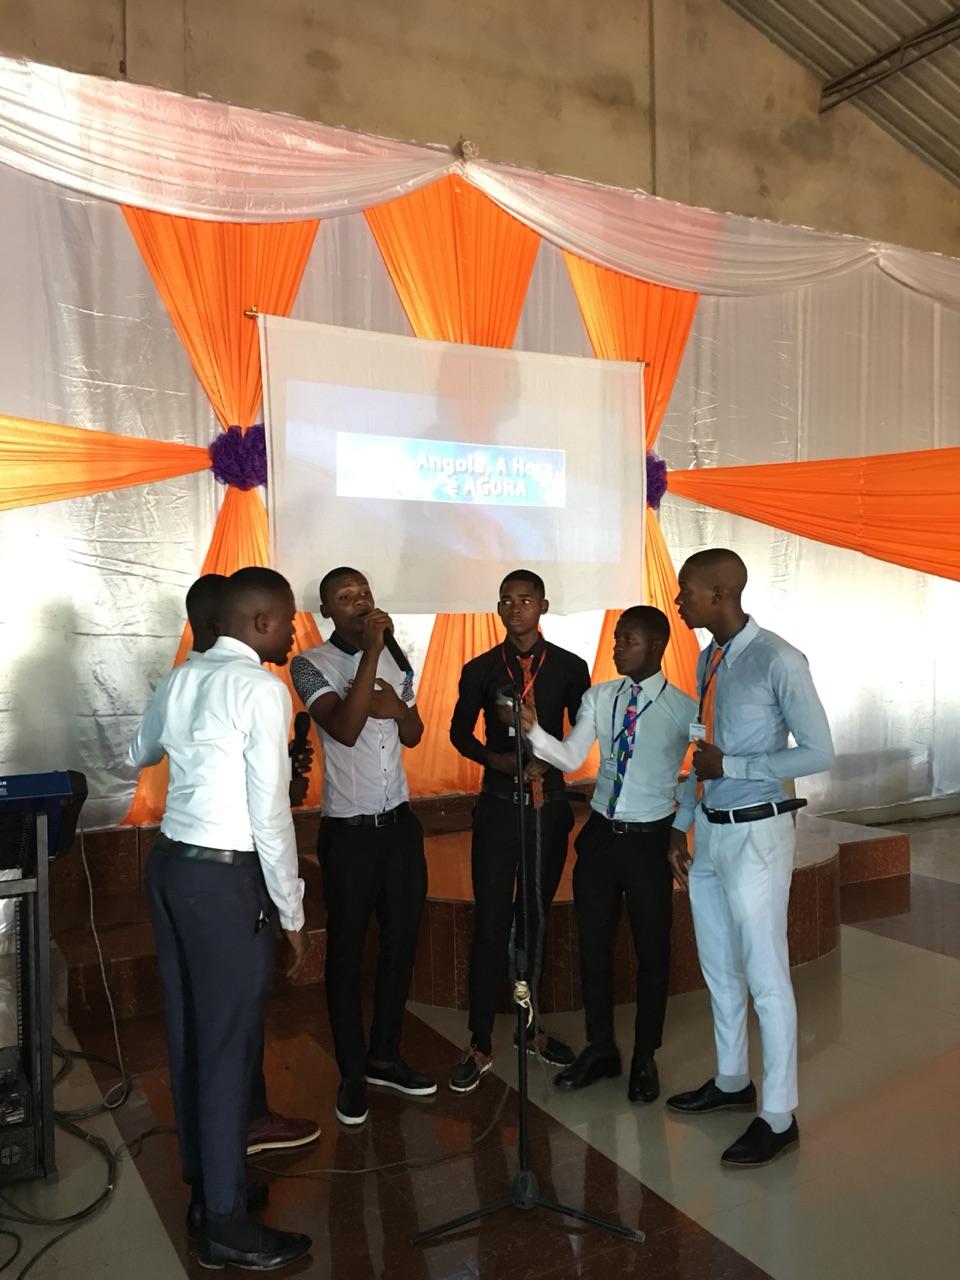 Young people sang before the Seminar